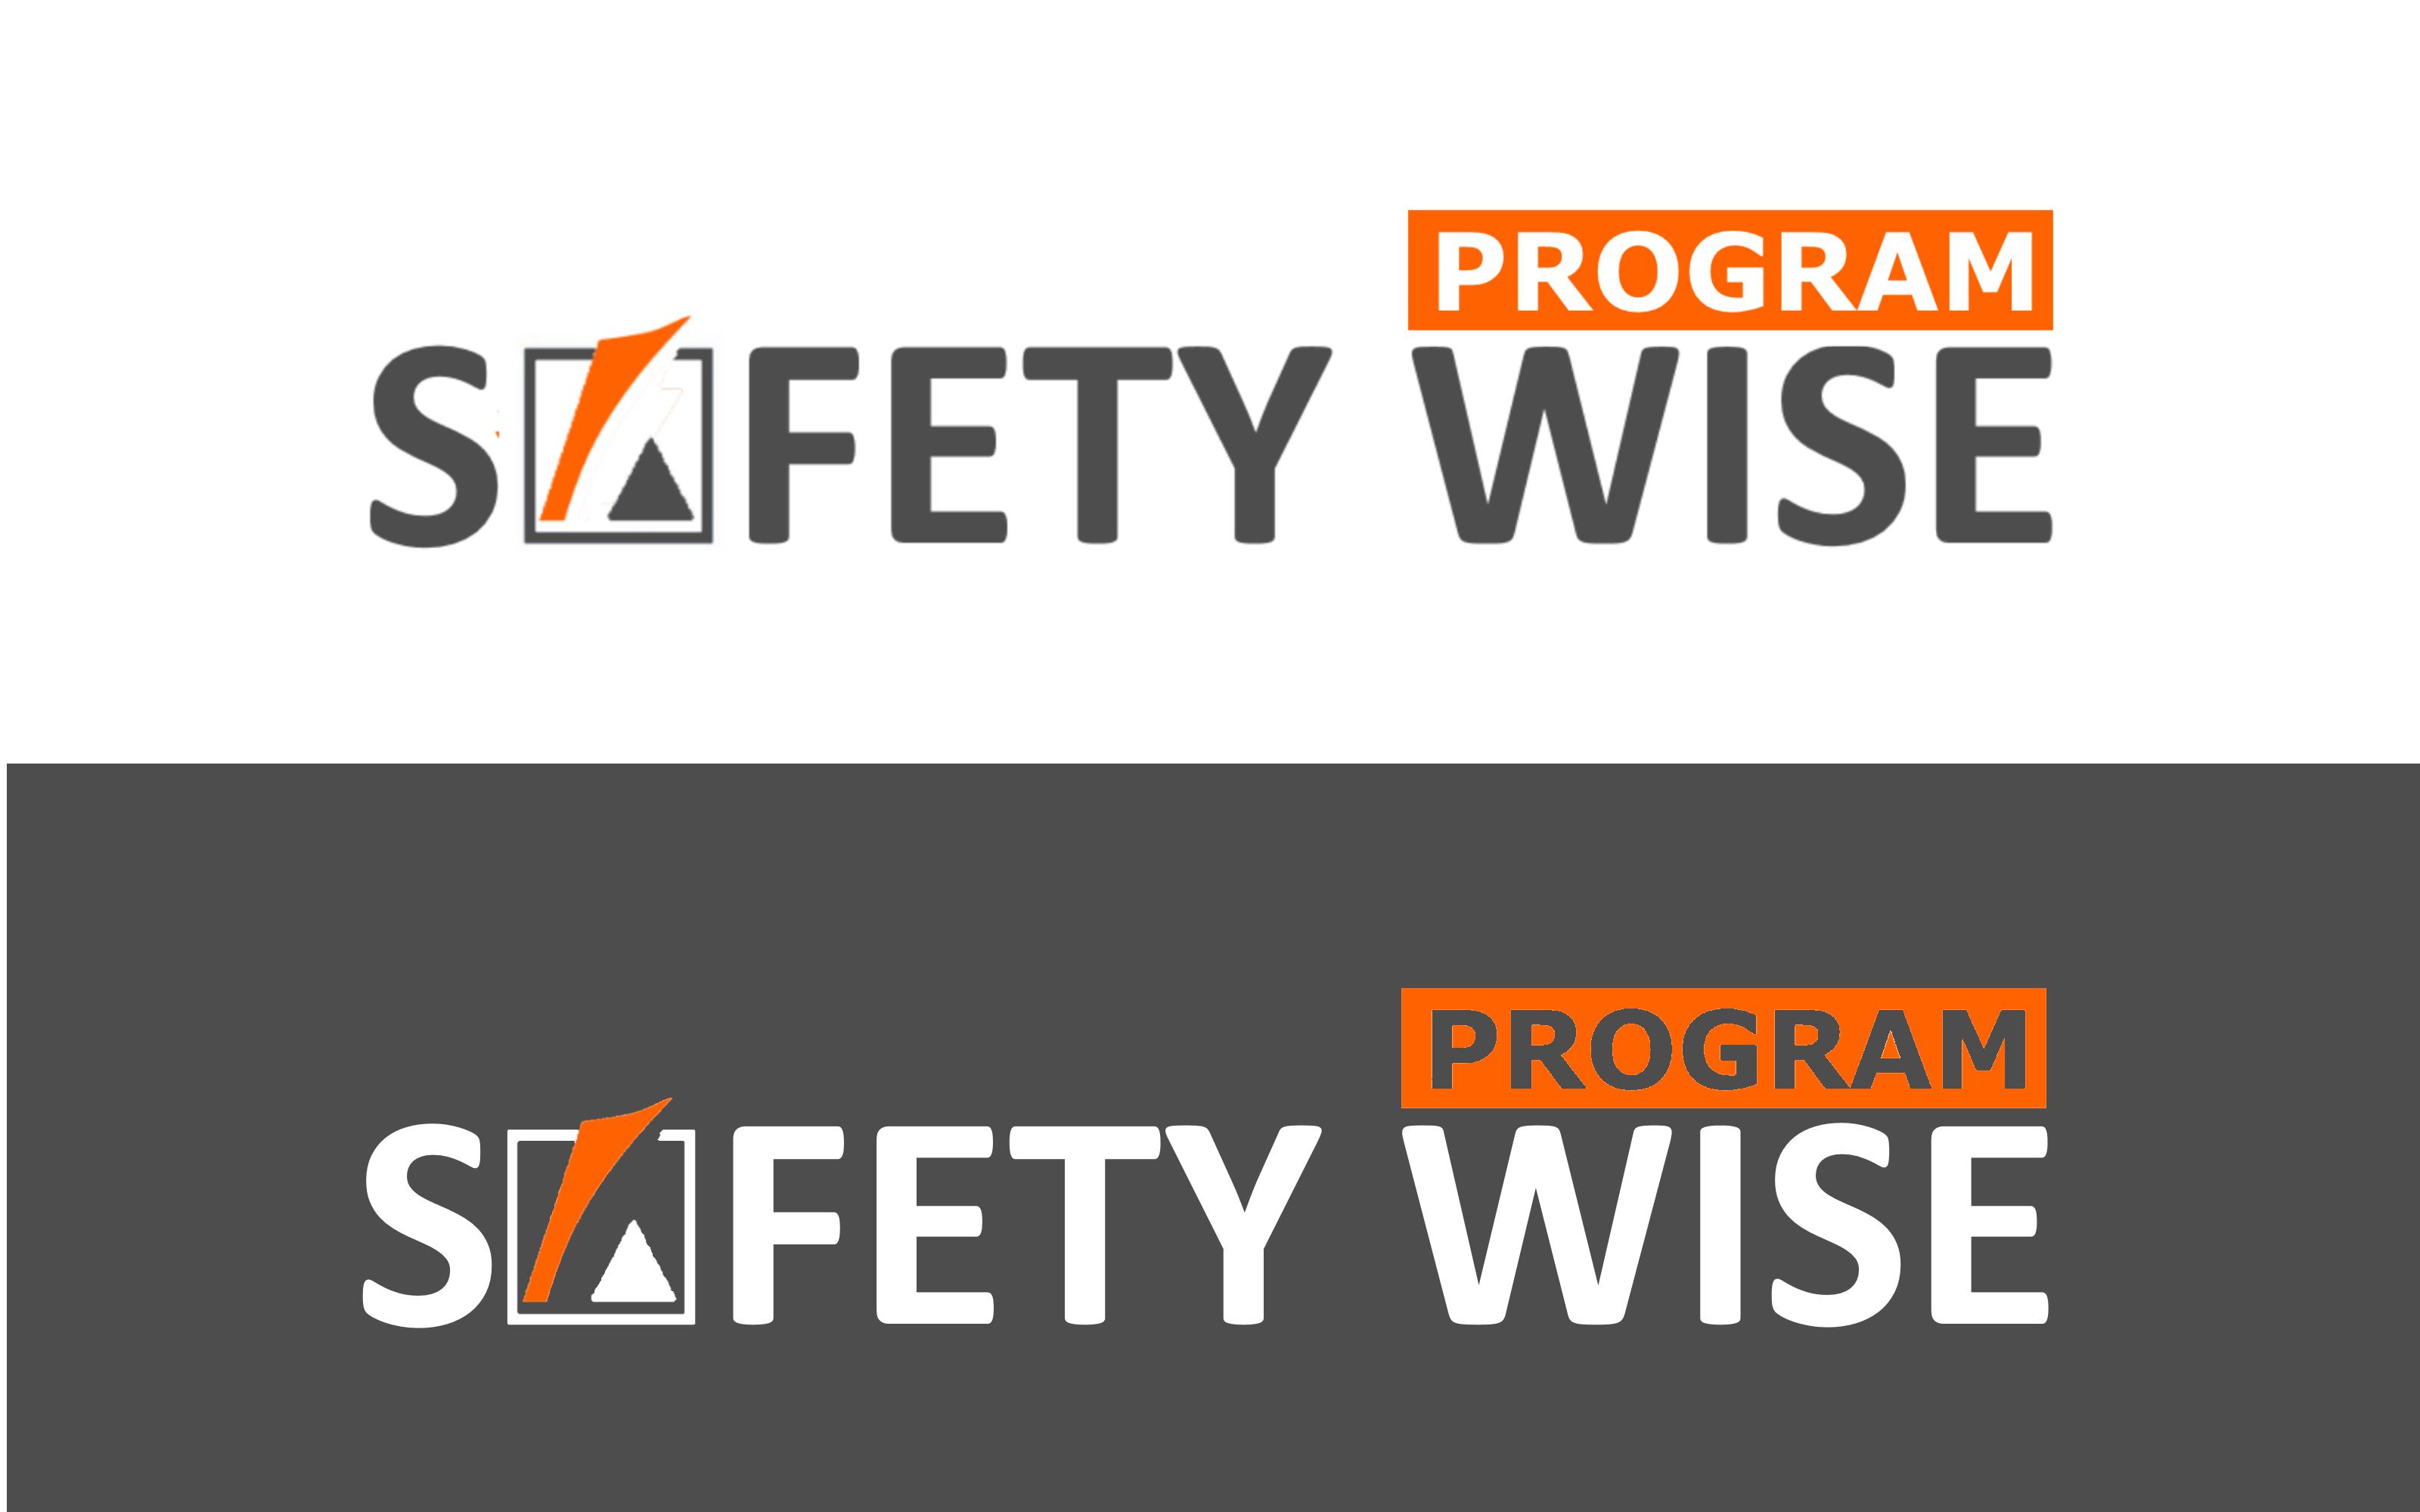 Logo Design by Roberto Bassi - Entry No. 162 in the Logo Design Contest New Logo Design for Safety Wise Program.